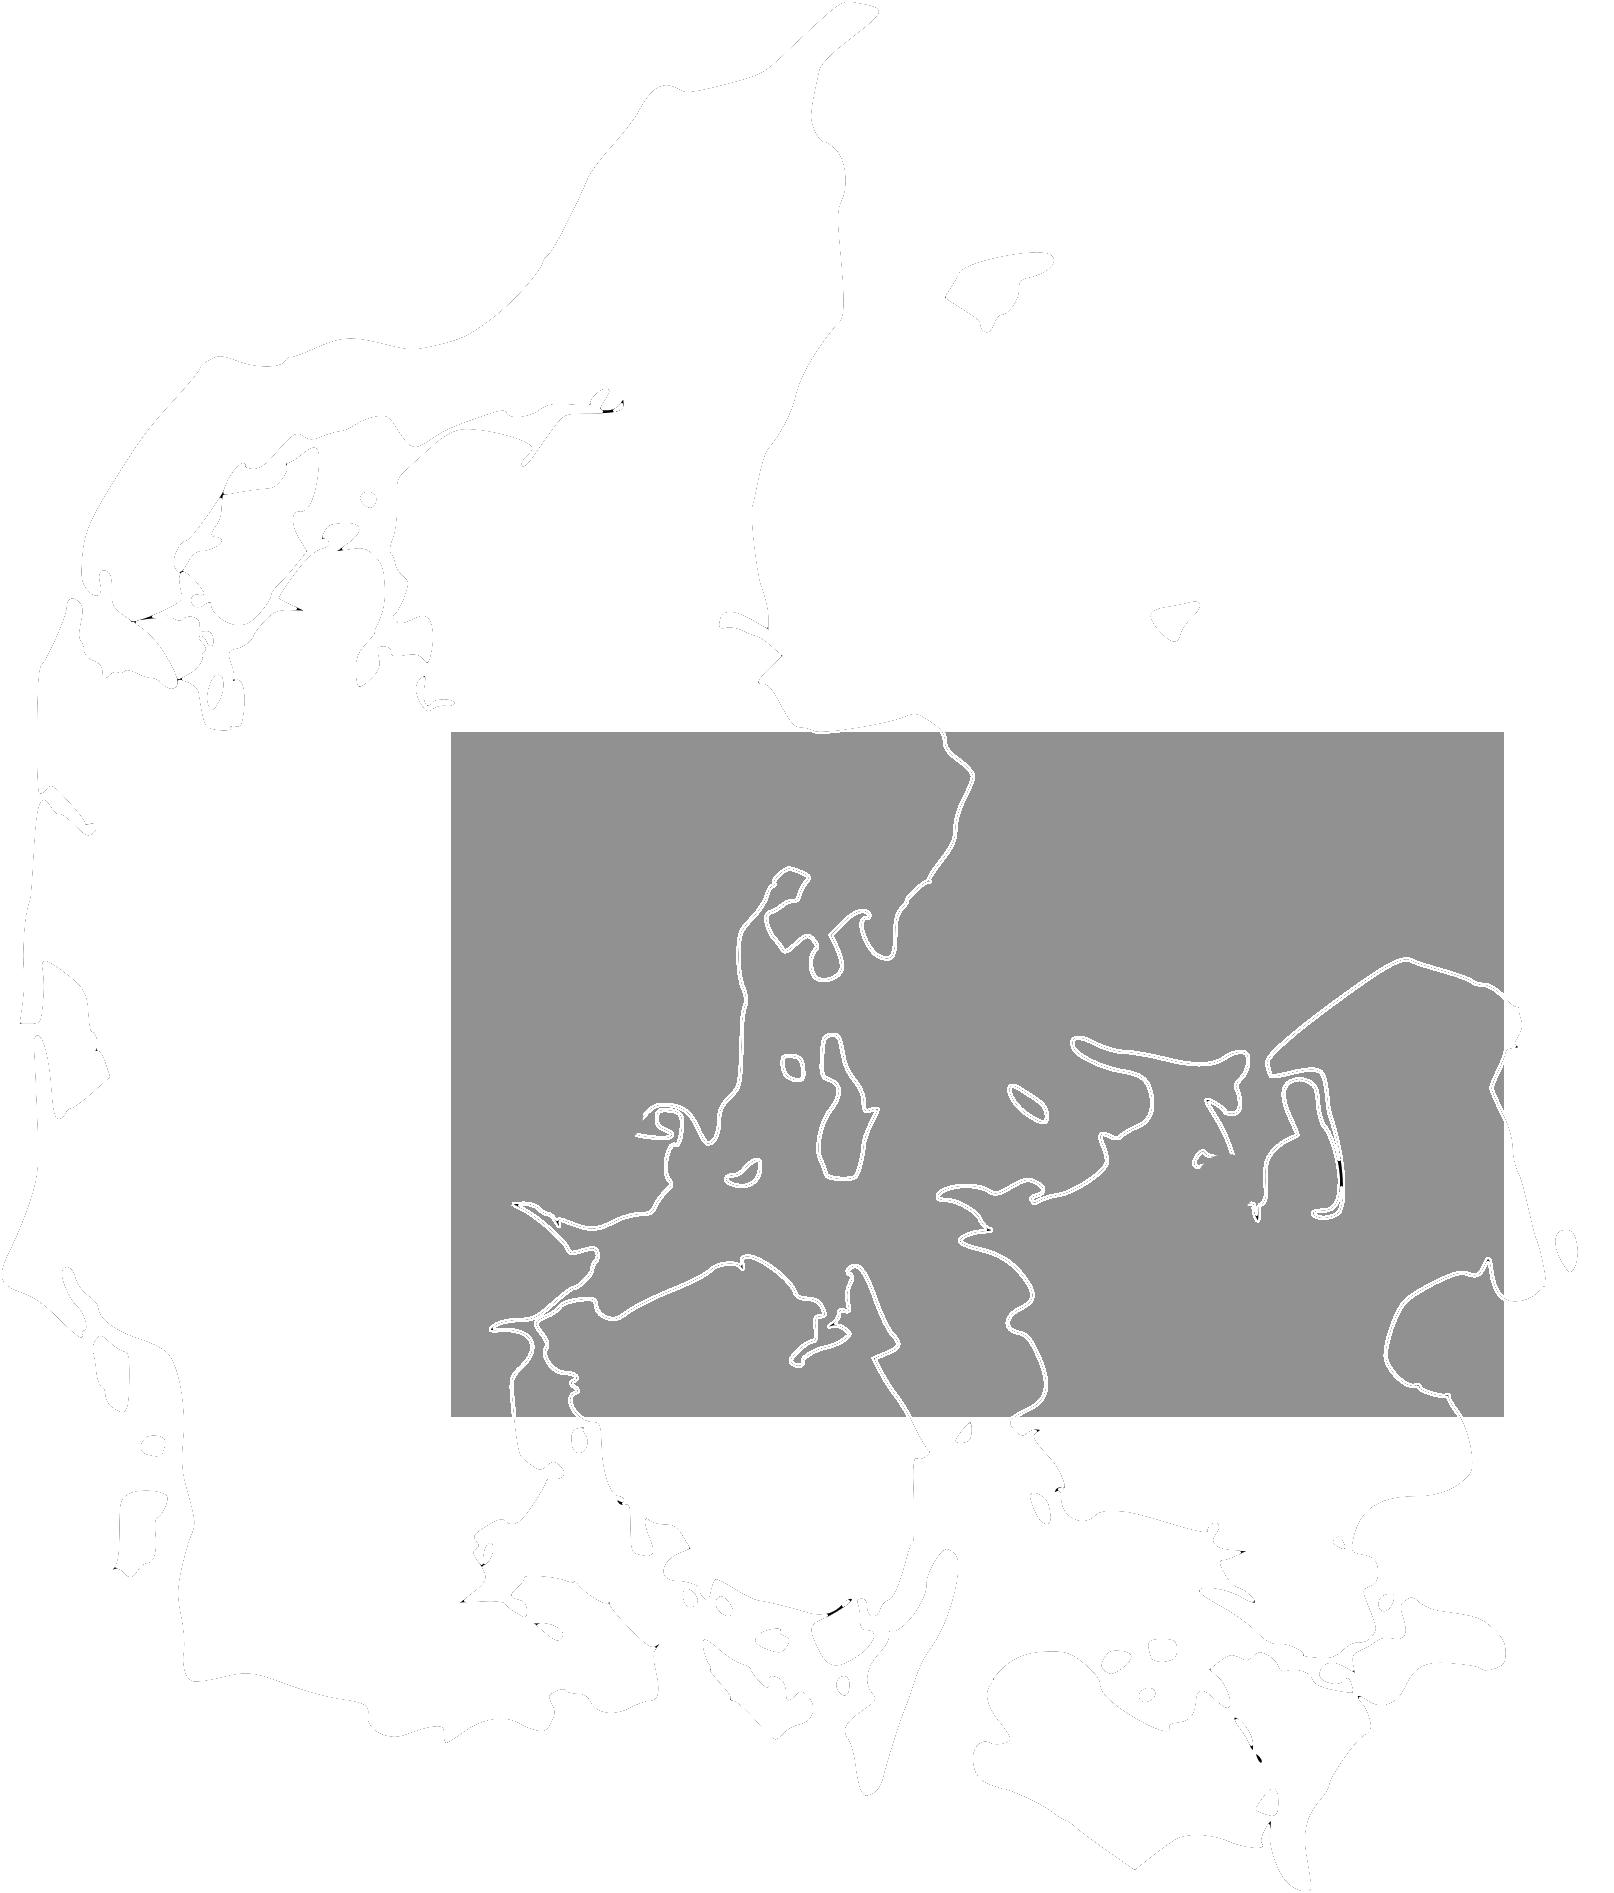 KSO-MAP-MED-PINS2